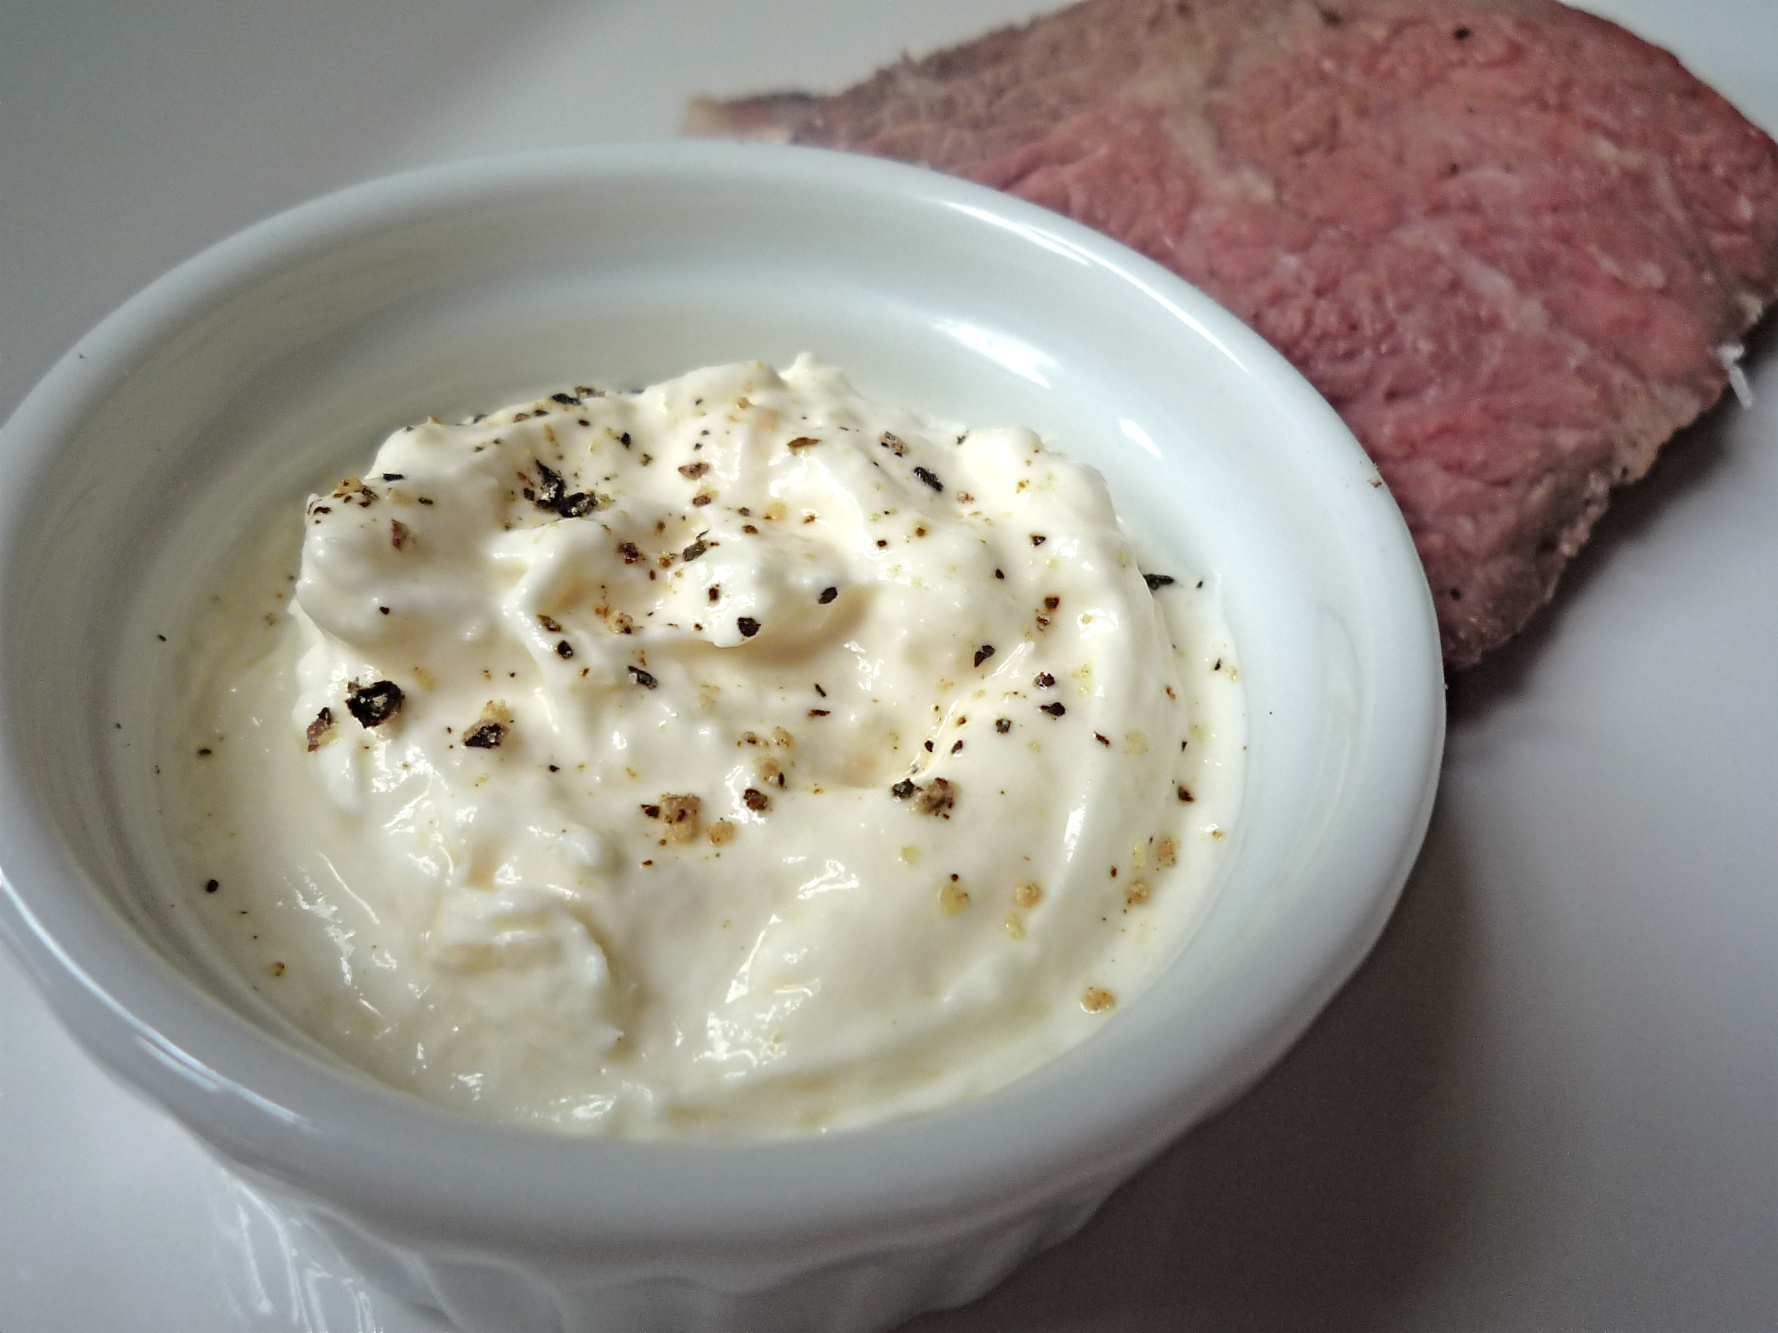 Horseradish Cream with medium-rare roast beef